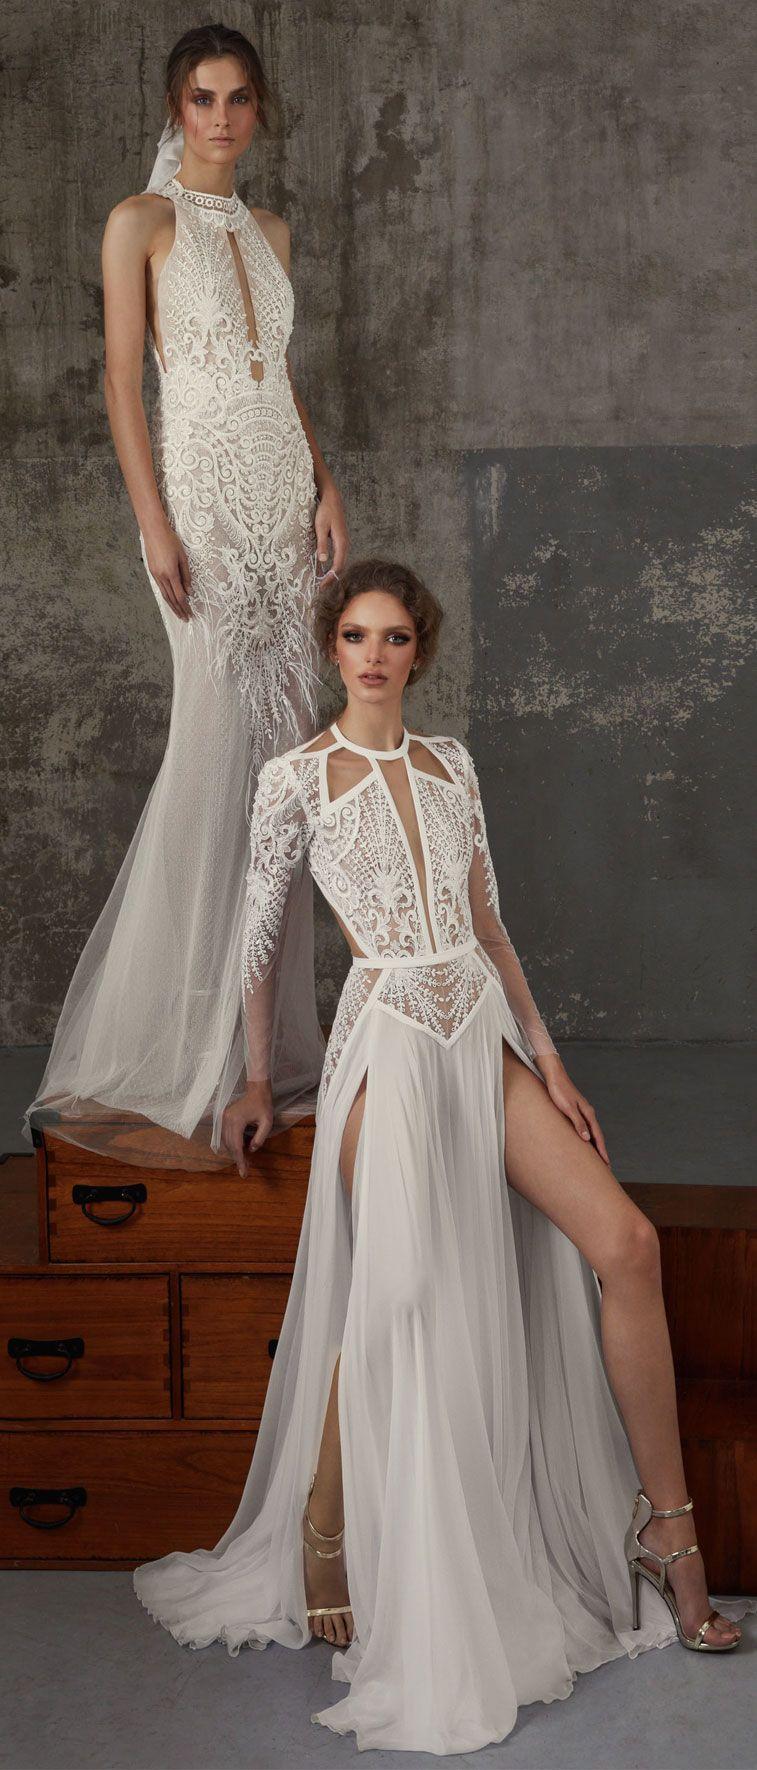 Lior Charchy Fall 2018 Wedding Dresses Wedding dresses